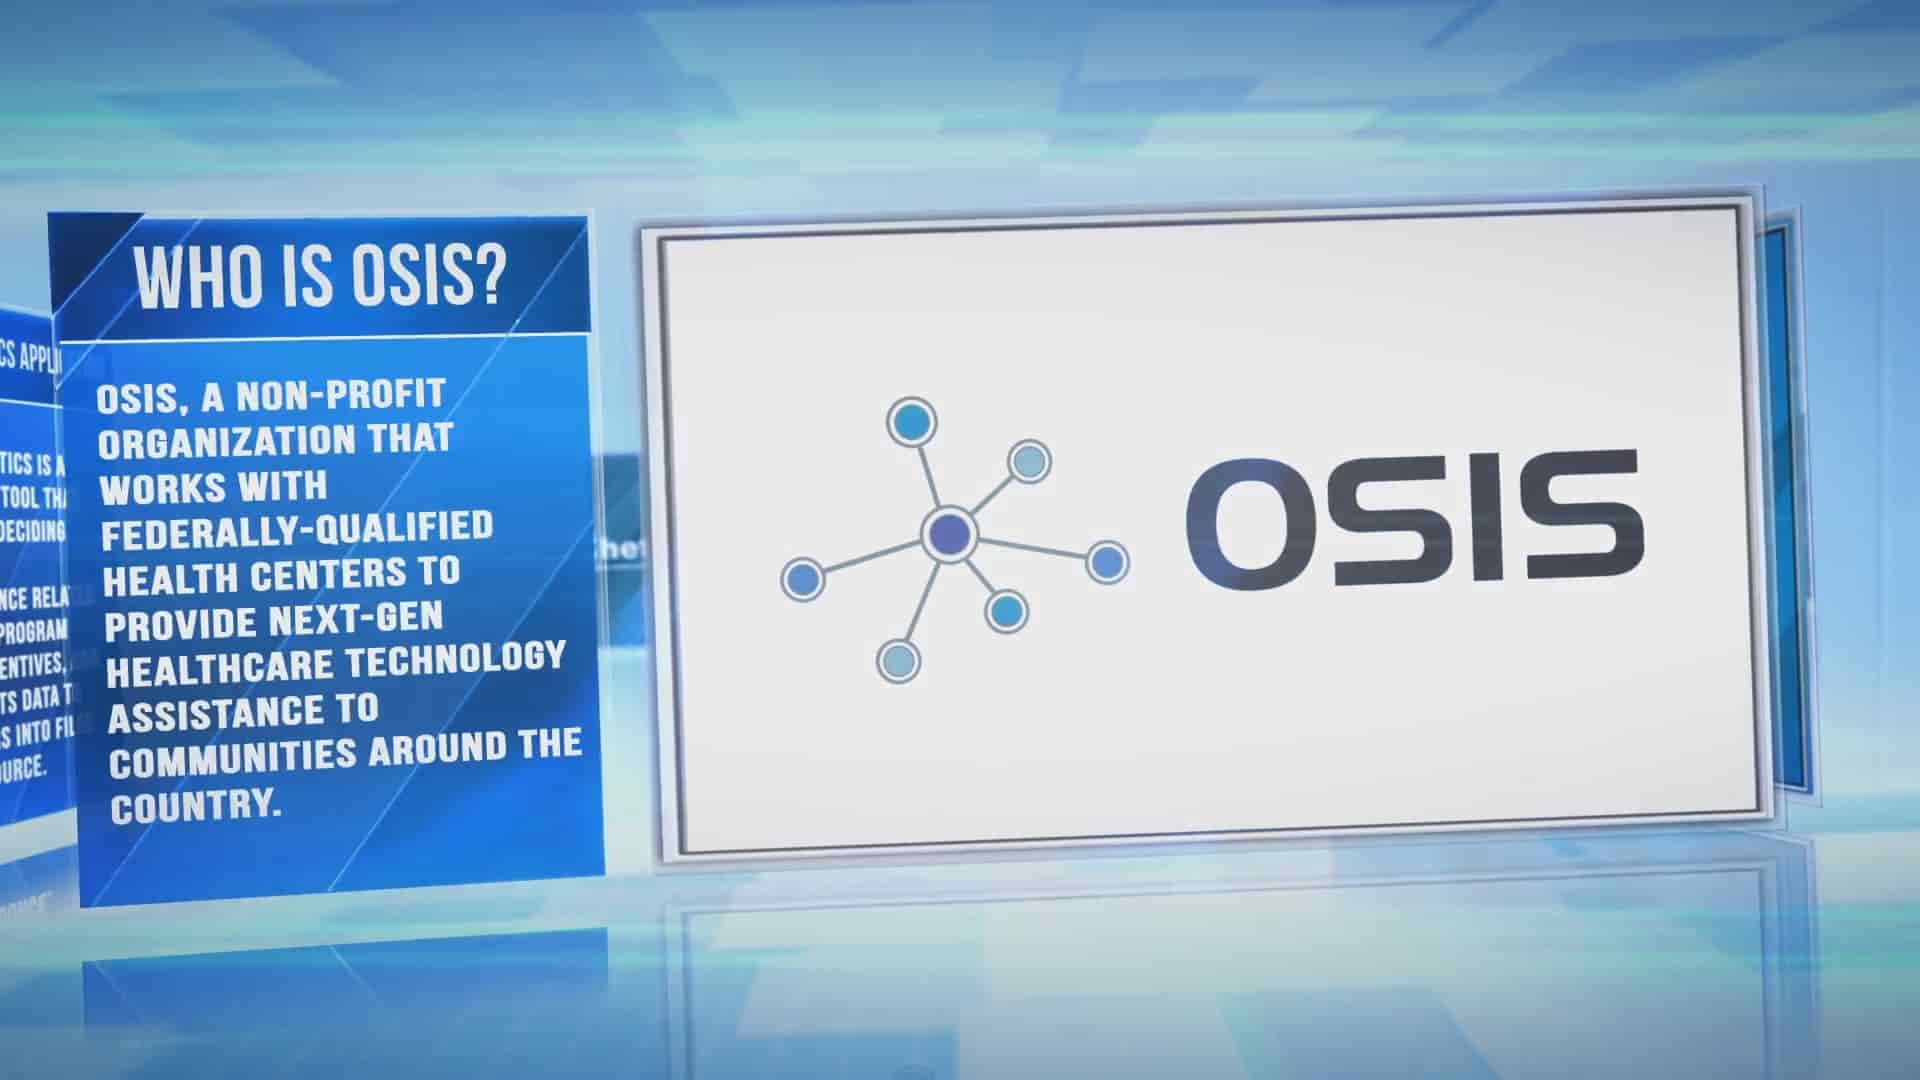 Osis Community Aalytics